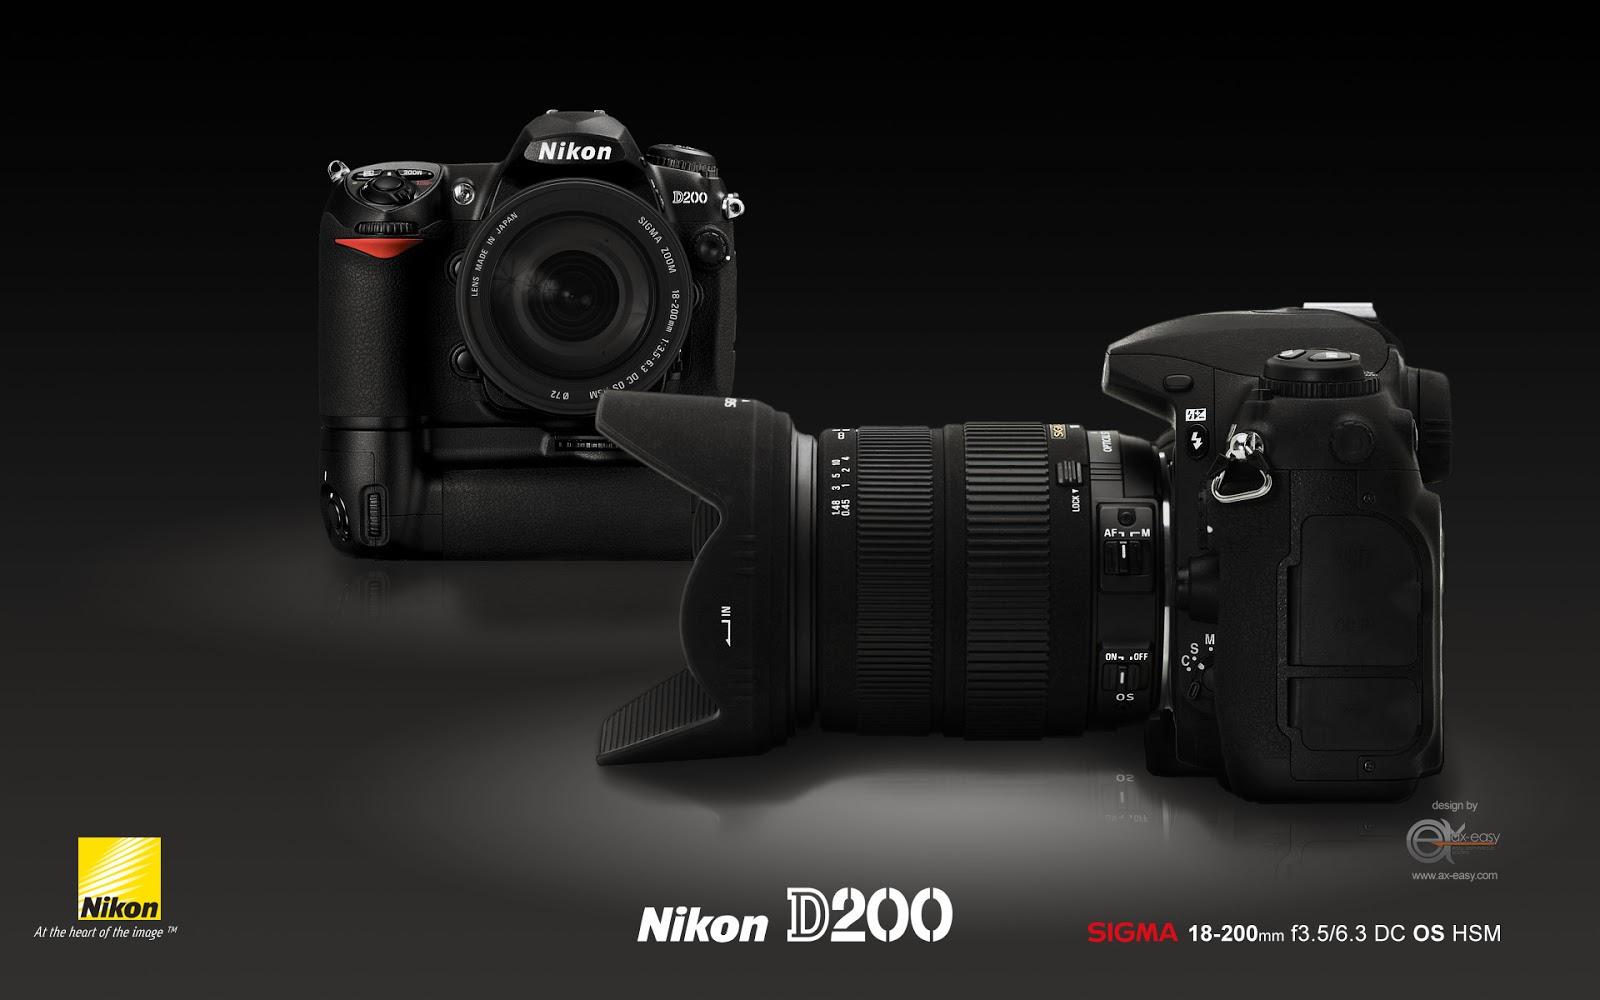 Nikon d200 wallpaper